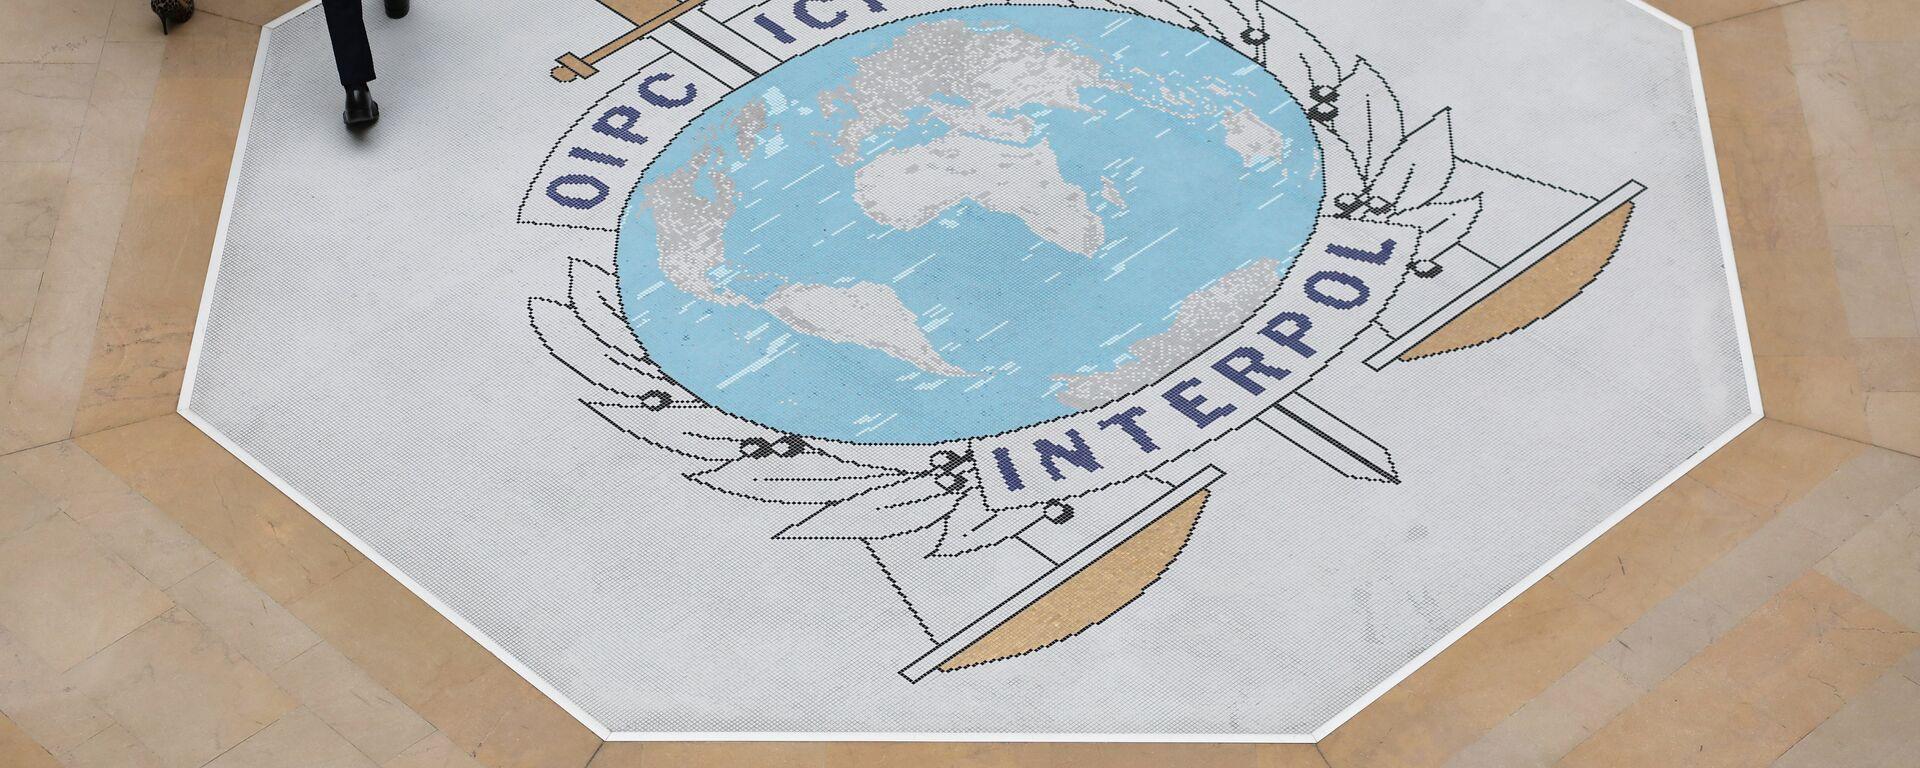 El logo de Interpol - Sputnik Mundo, 1920, 16.08.2021